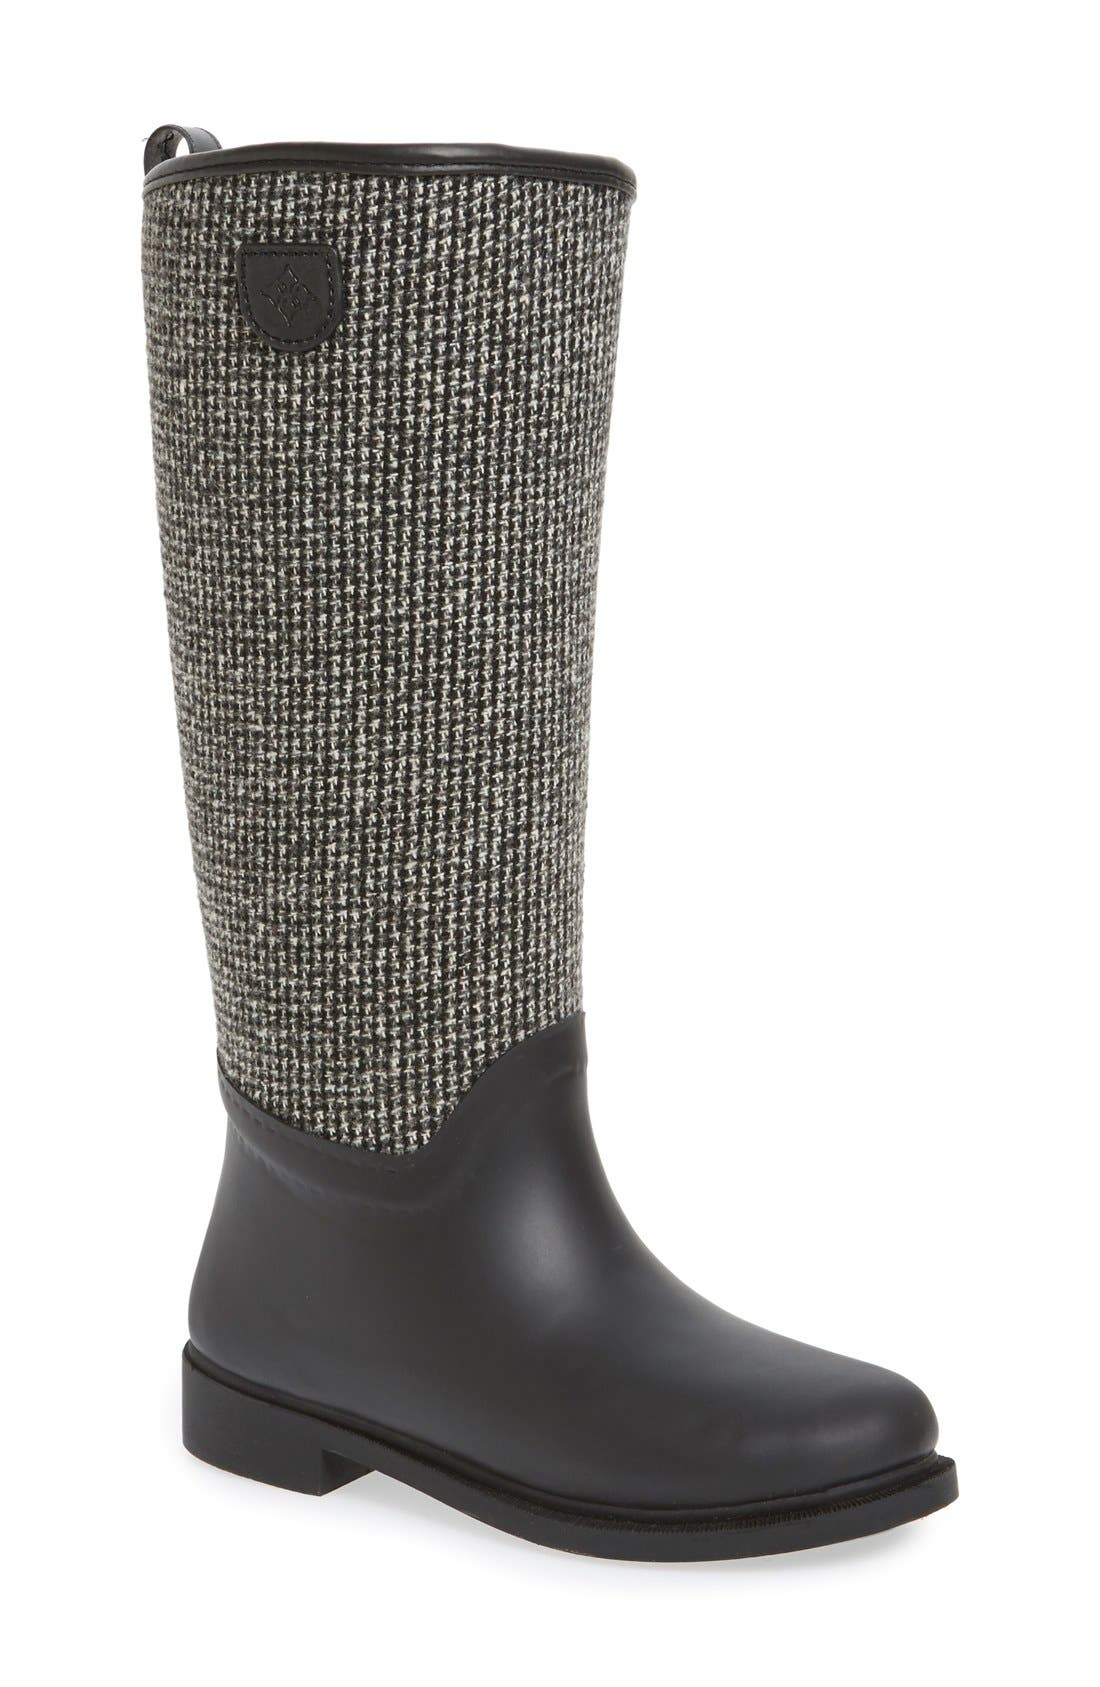 Dav Cardiff Tweed Knee High Waterproof Rain Boot